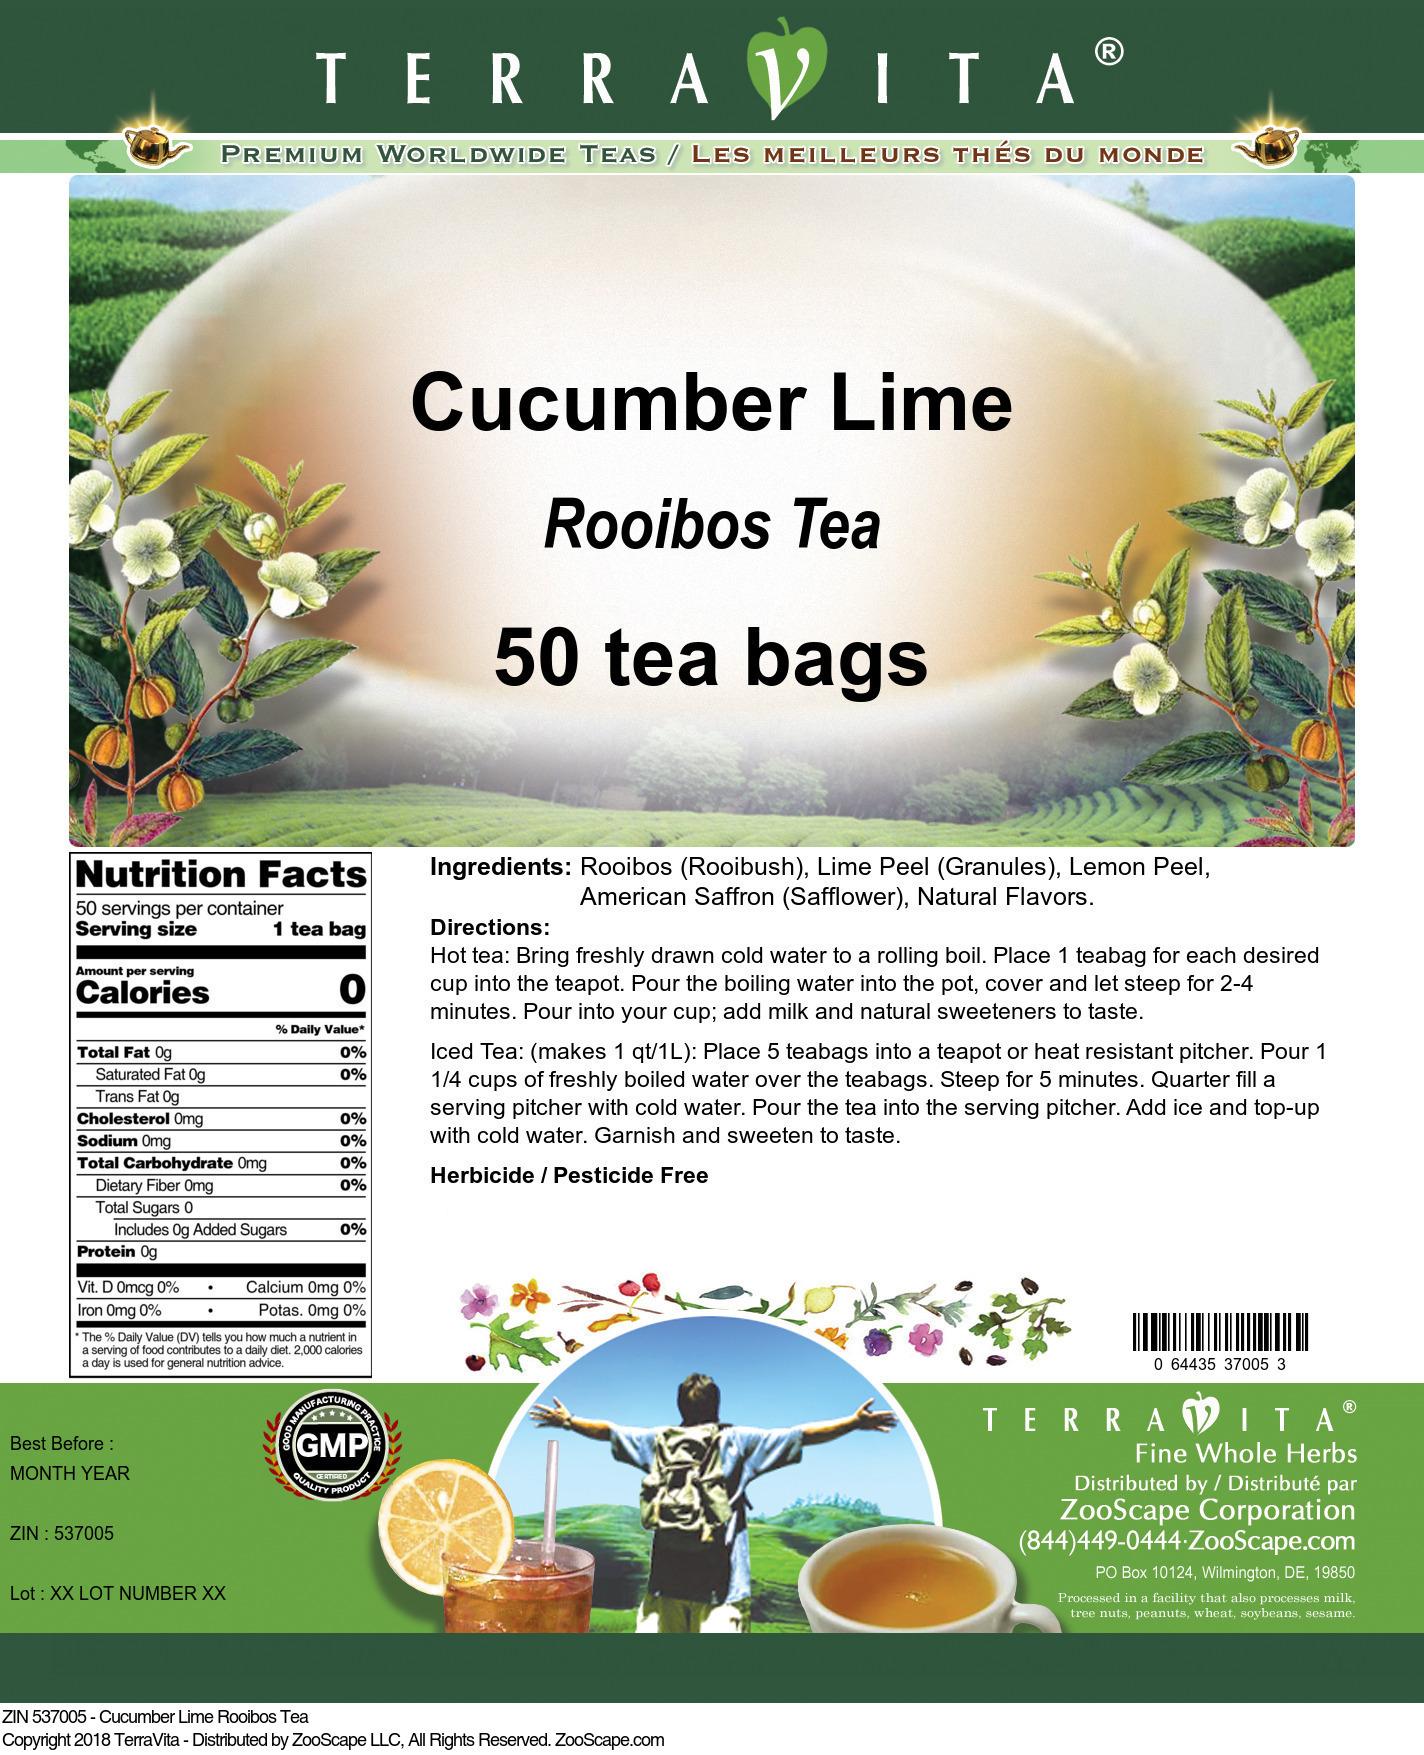 Cucumber Lime Rooibos Tea